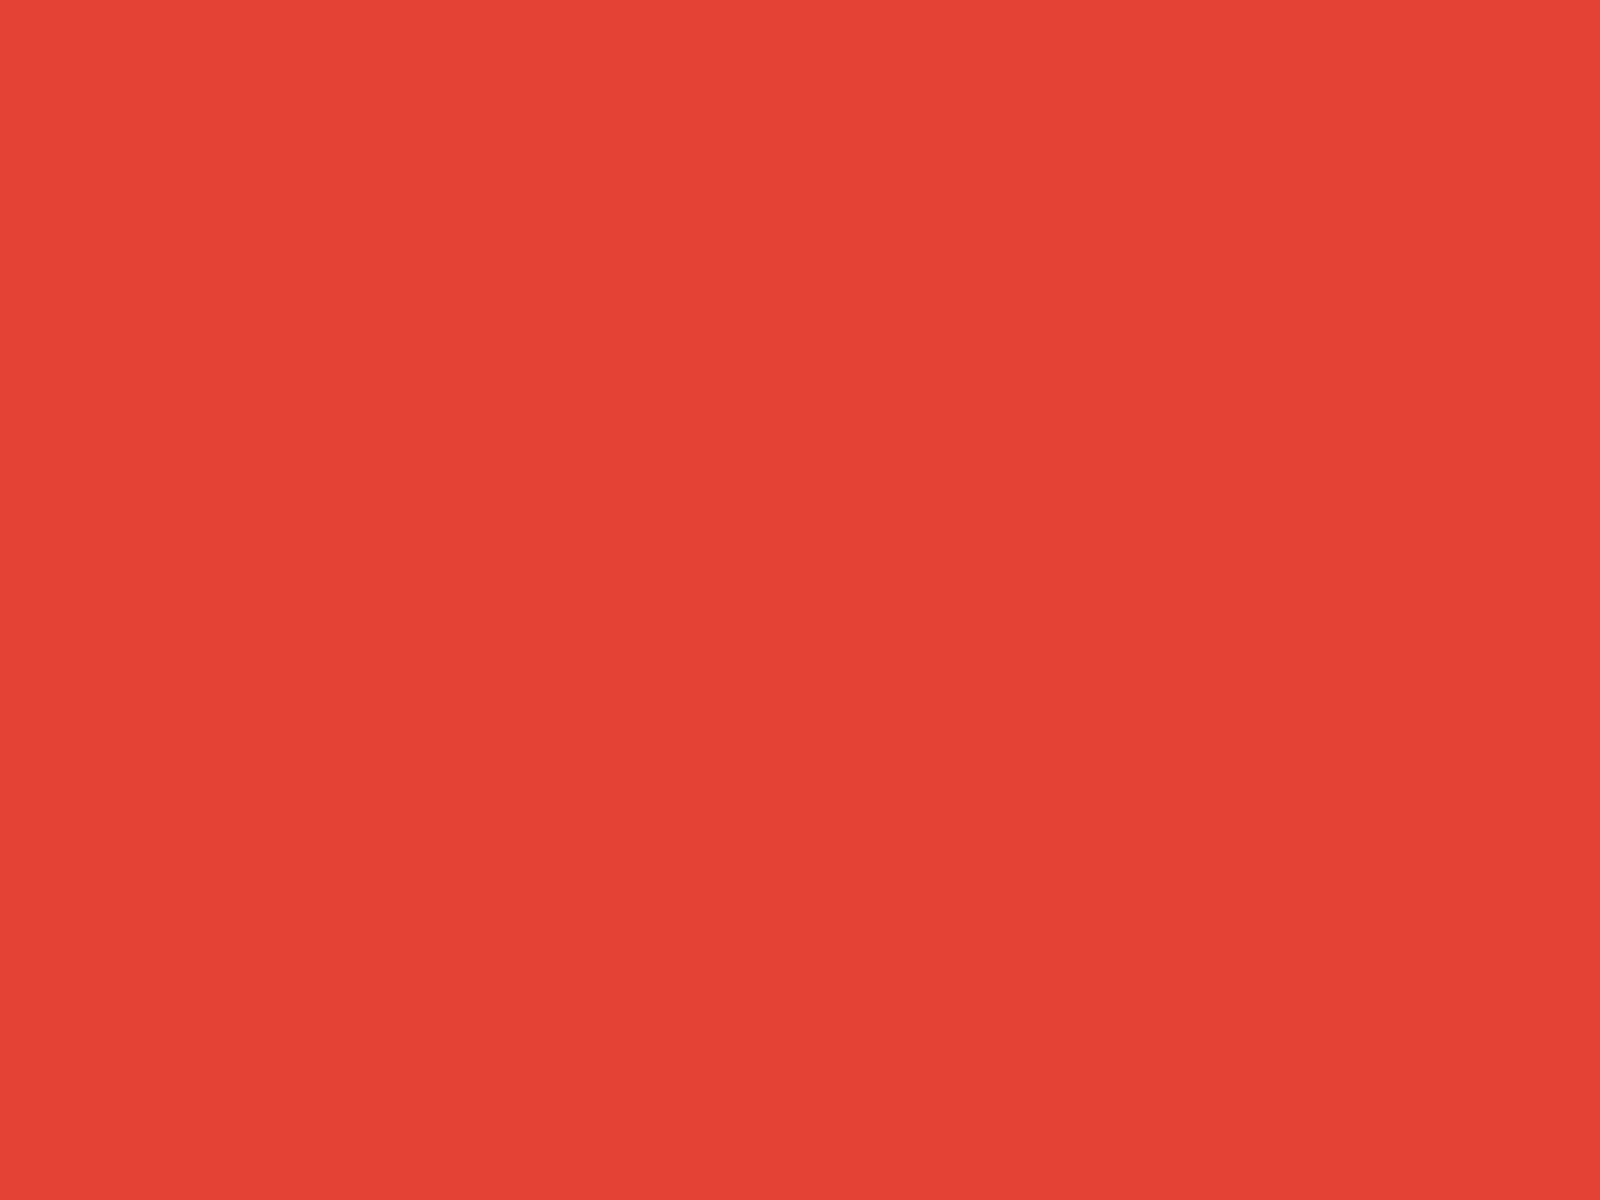 1600x1200 Vermilion Cinnabar Solid Color Background